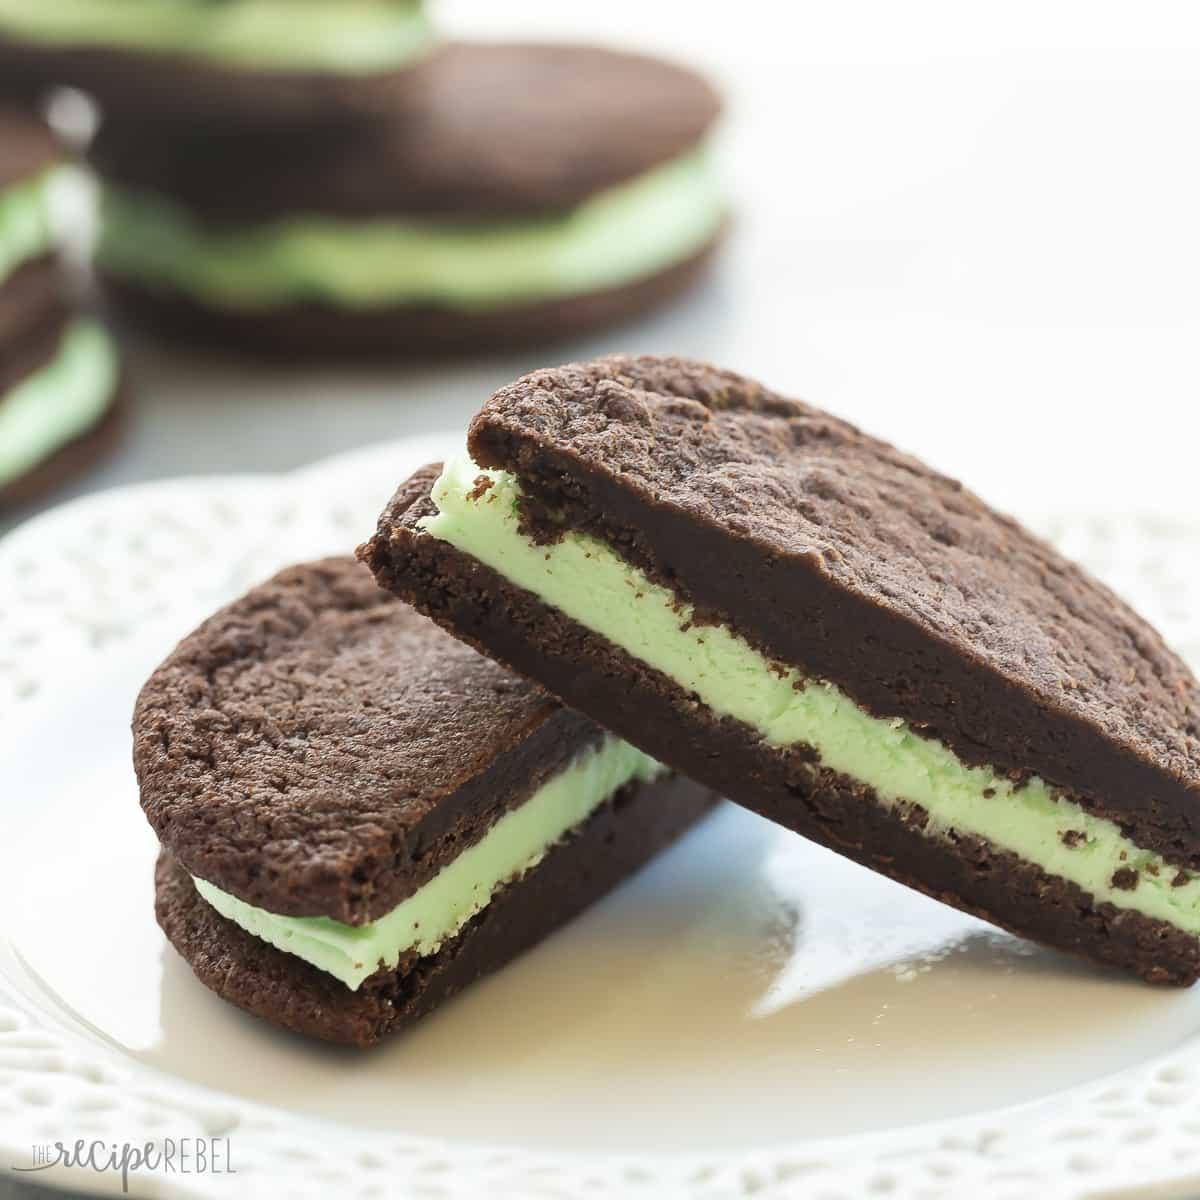 Homemade Mint Chocolate Oreos (sandwich Cookies)